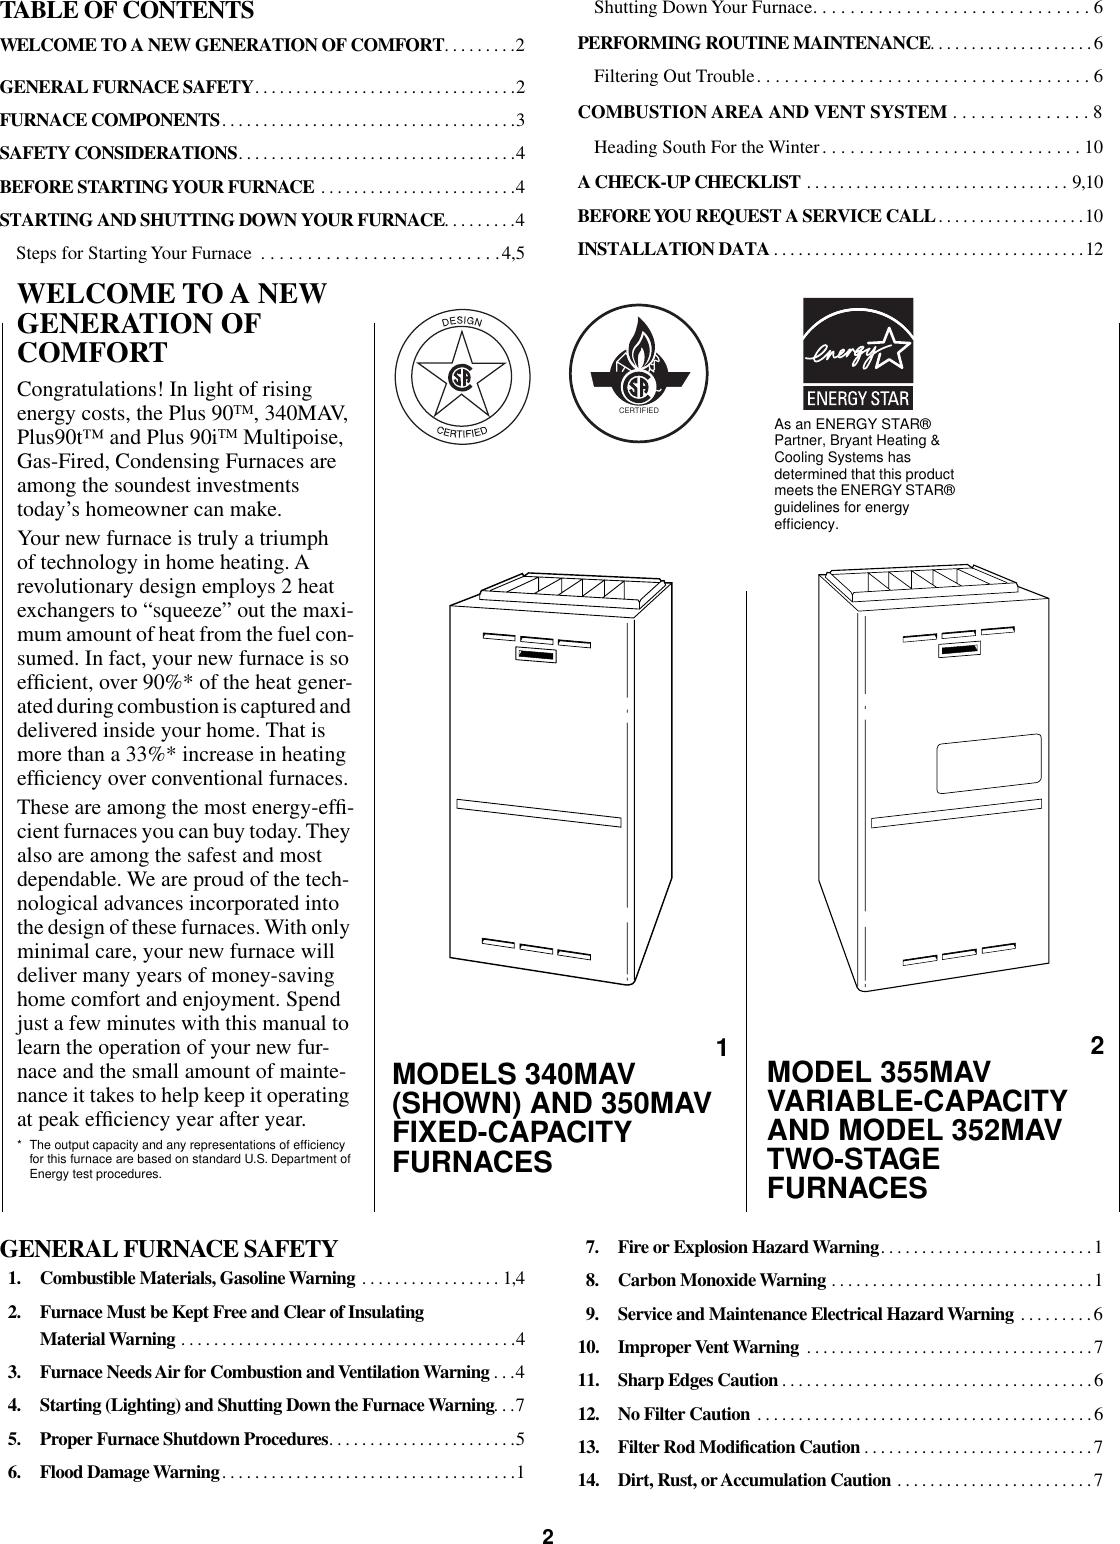 Bryant 340Mav Users Manual OM05 45K